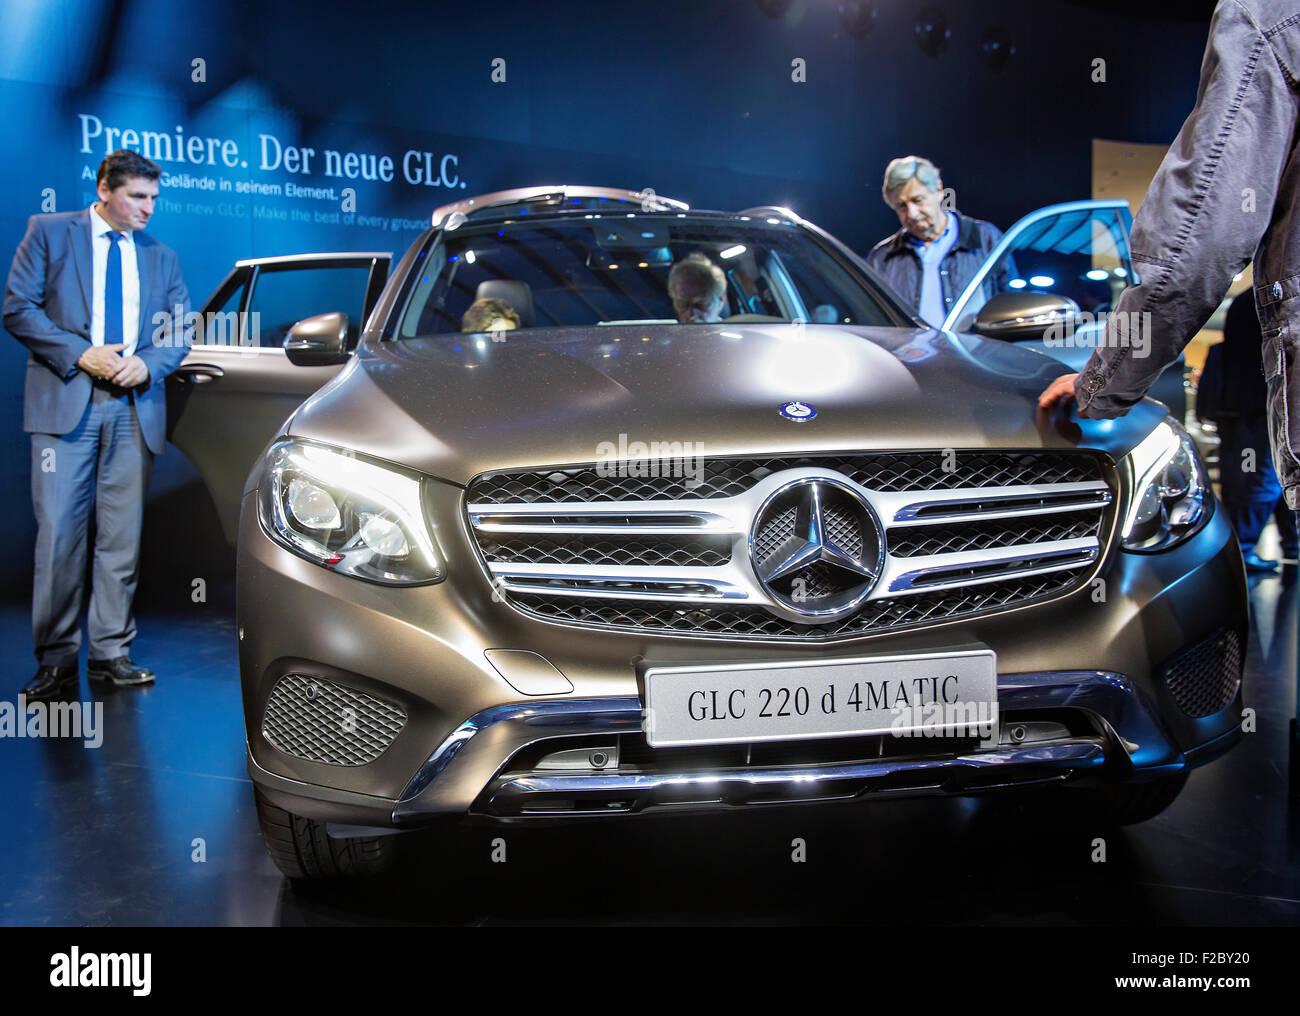 Mercedes-Benz GLC 220 d, International motorshow, IAA, Frankfurt, Auto Show, stand - Stock Image